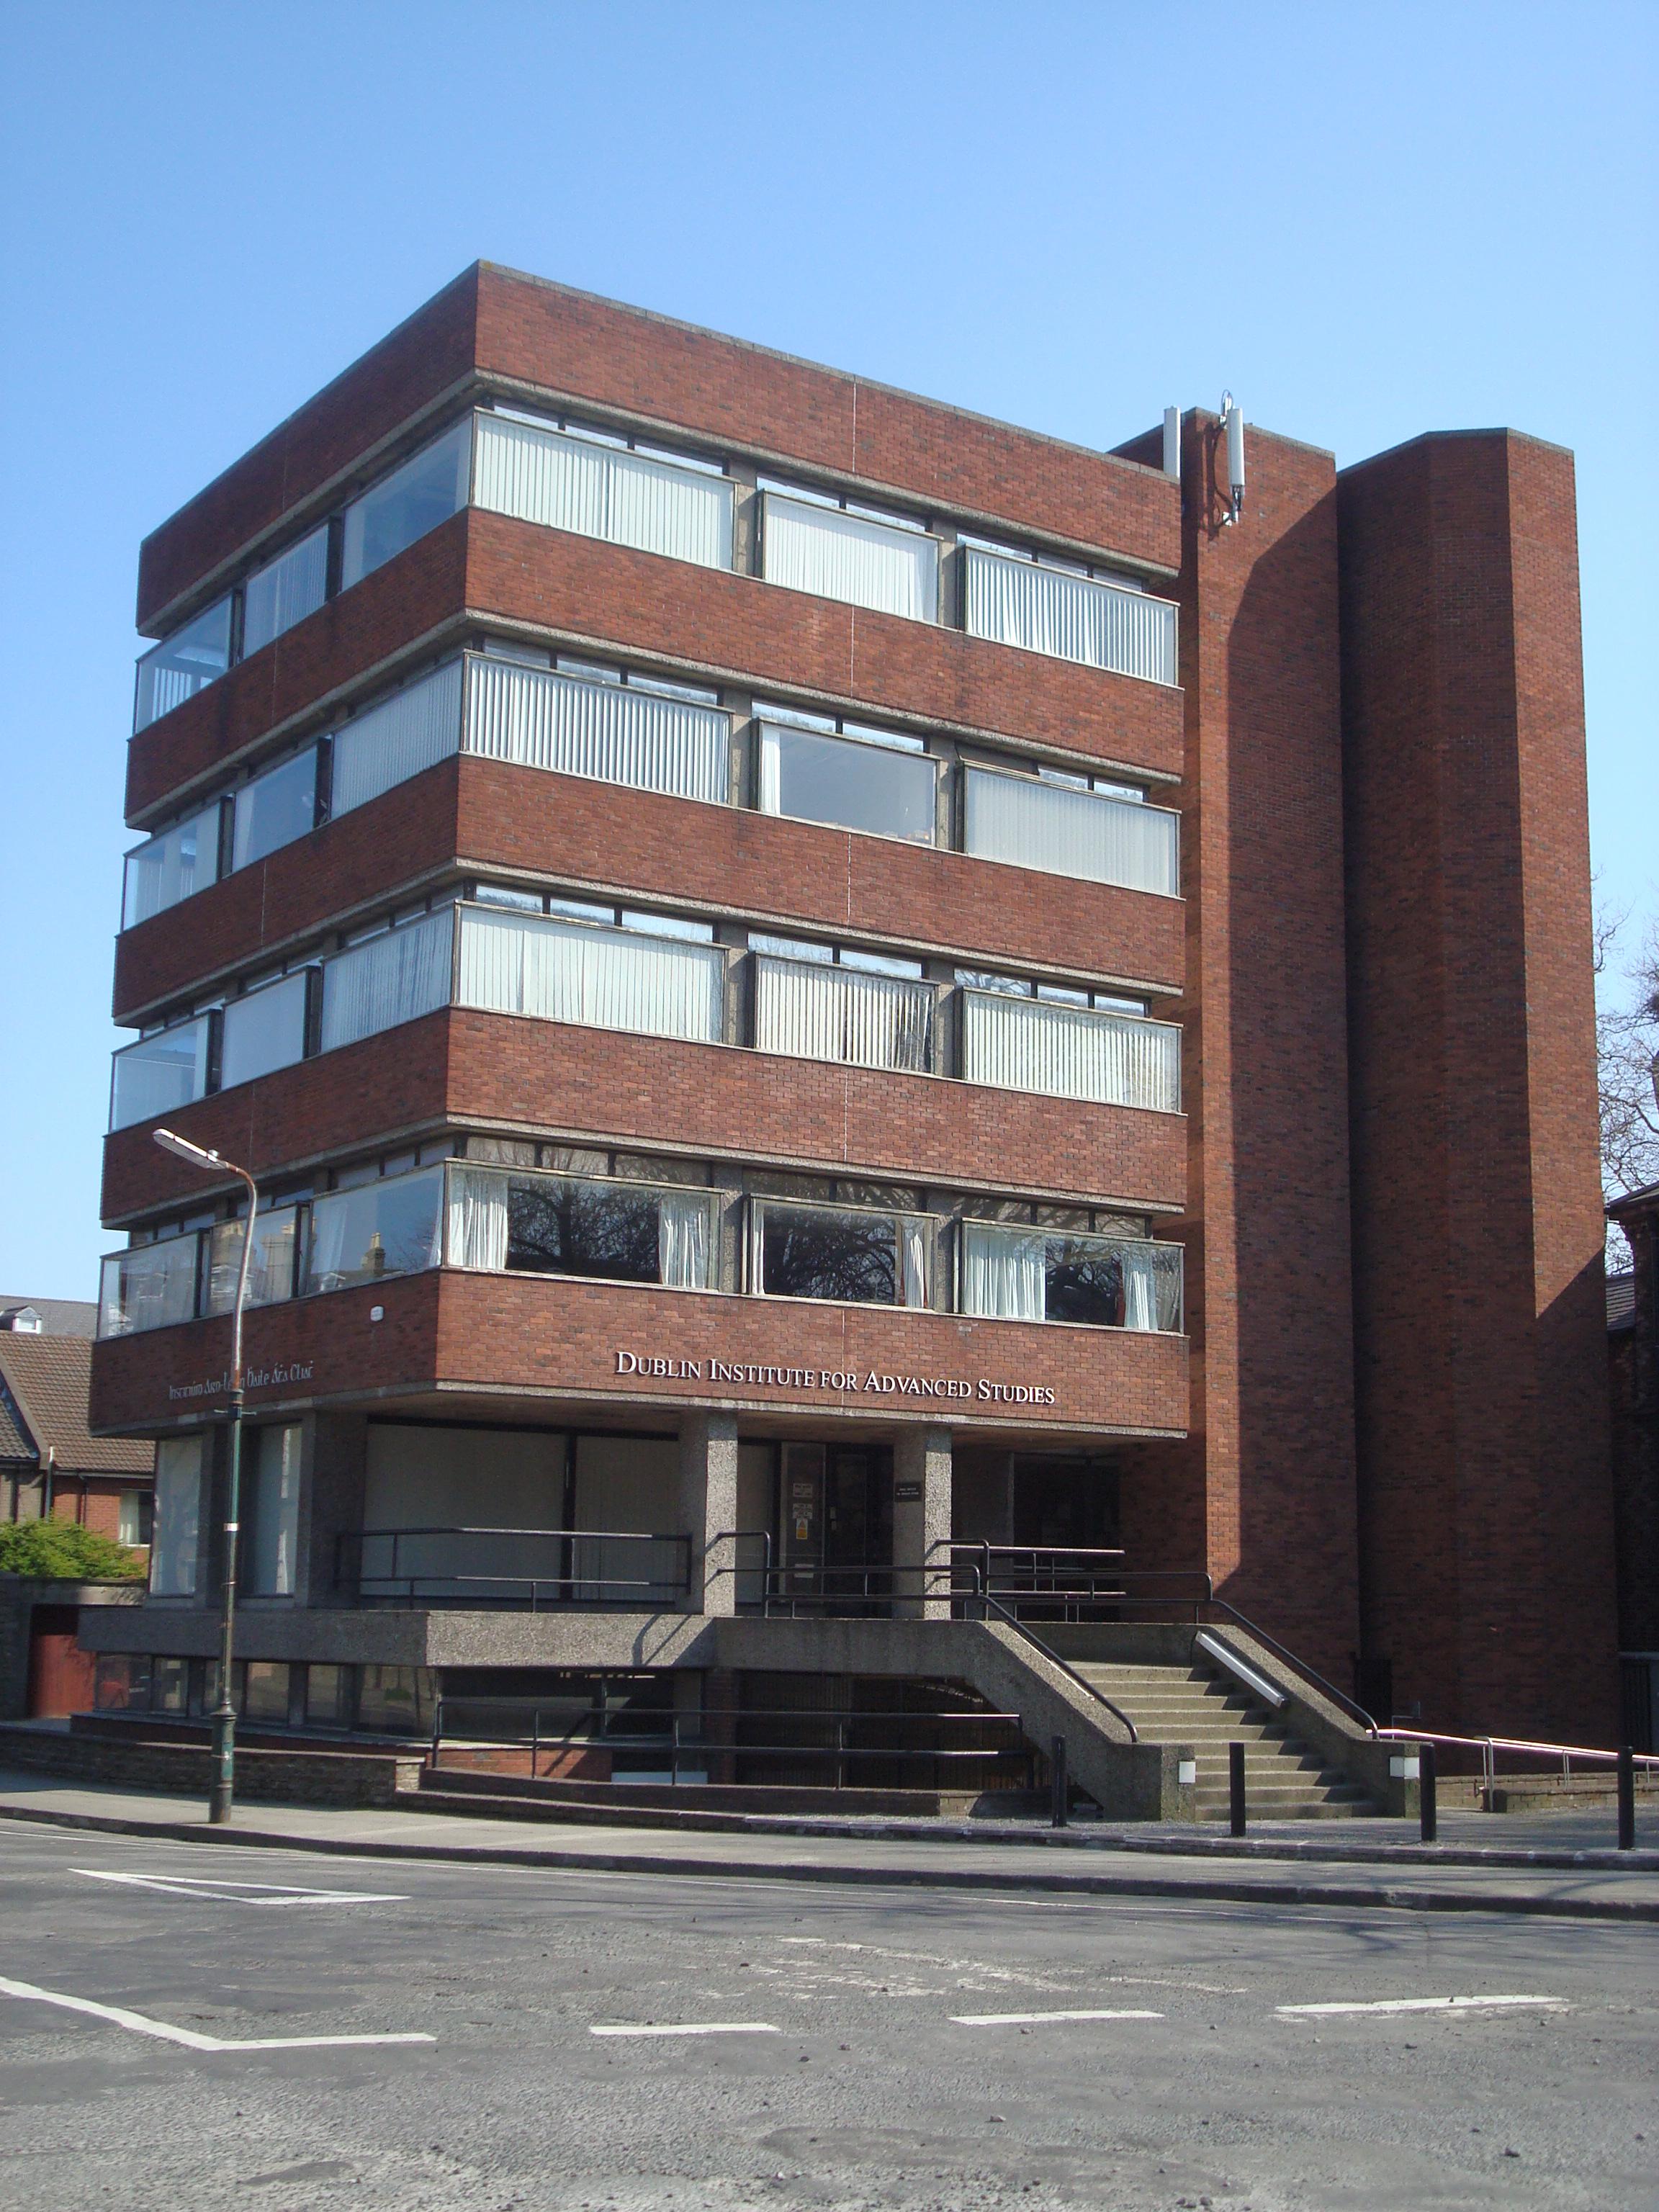 File:Dublin Institute for Advanced Studies, School of